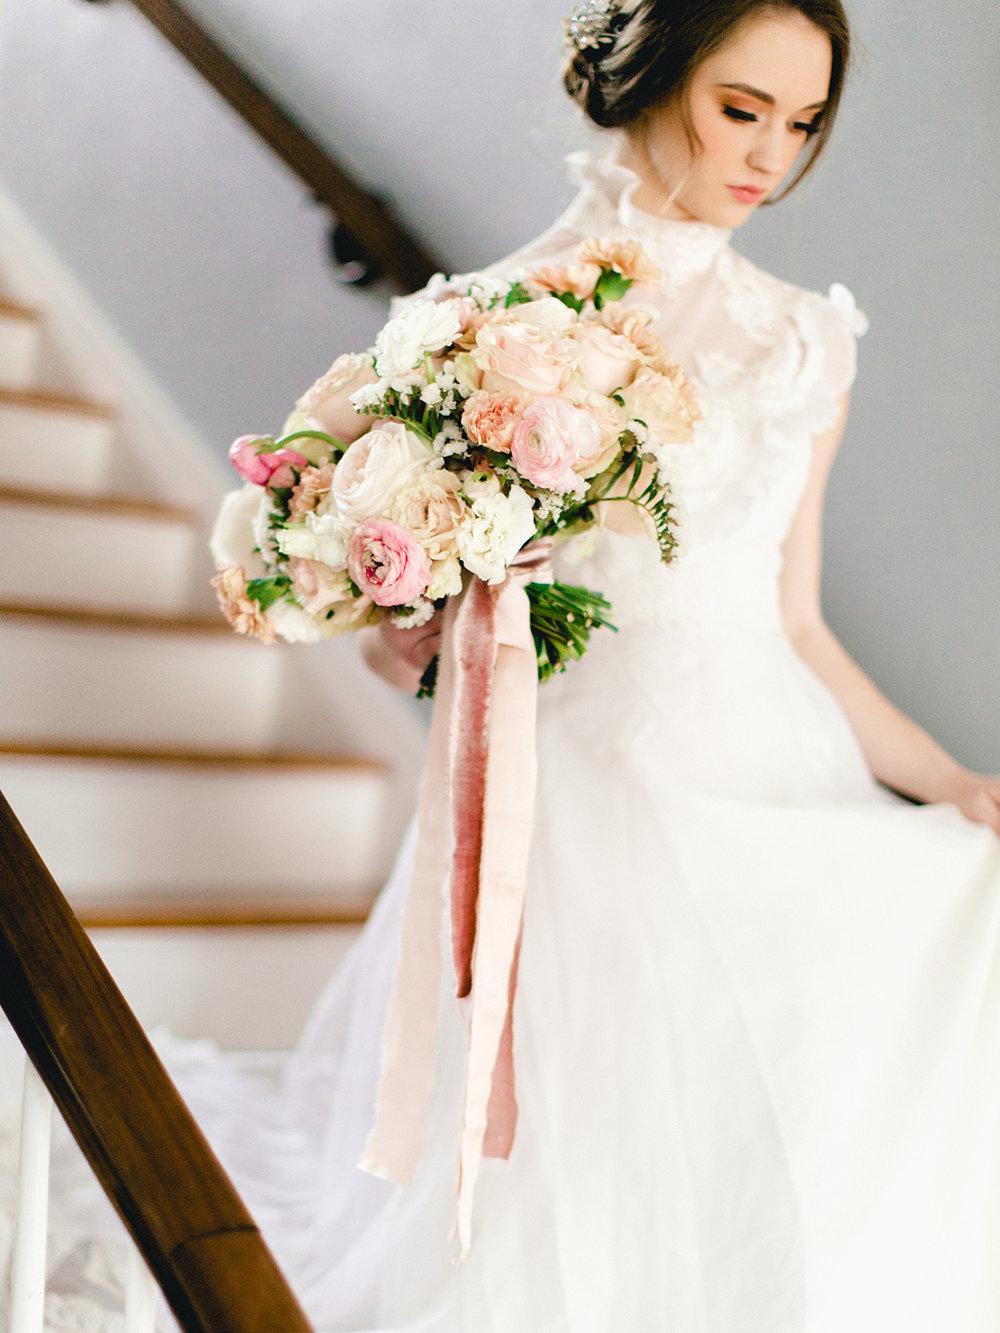 Soft and Feminine Silk Velvet RIbbons for sophisticated bridal bouquet ideas